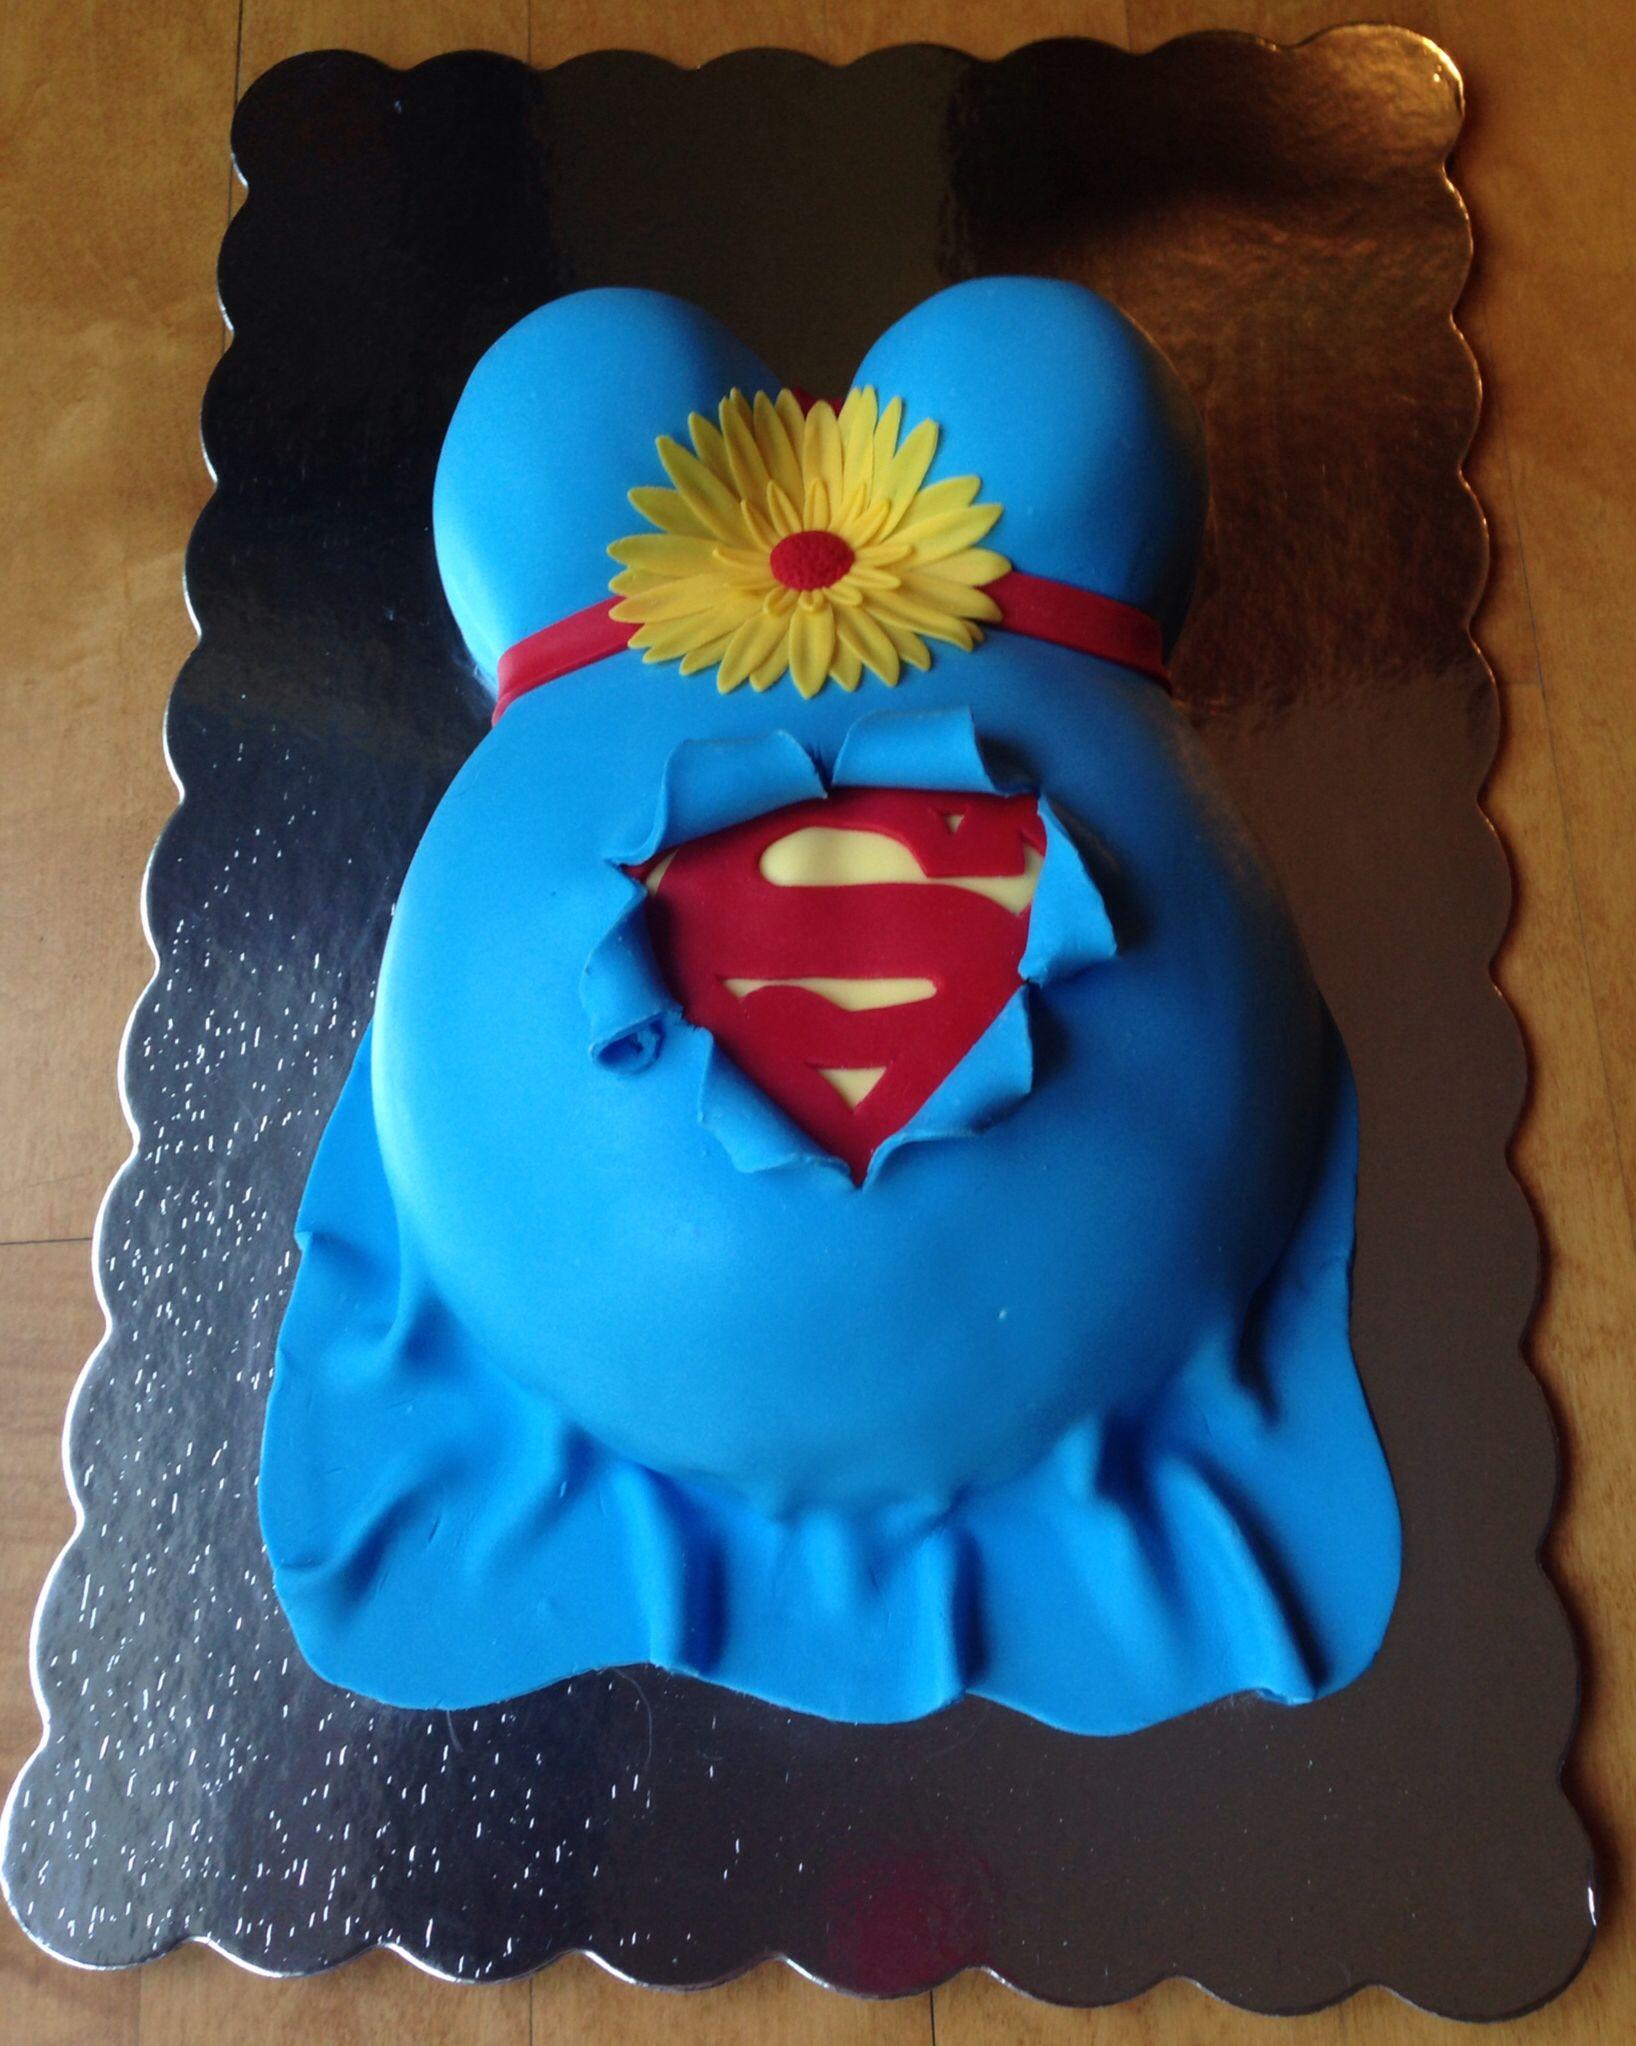 baby shower cakes baby shower ideas superhero baby shower baby shower